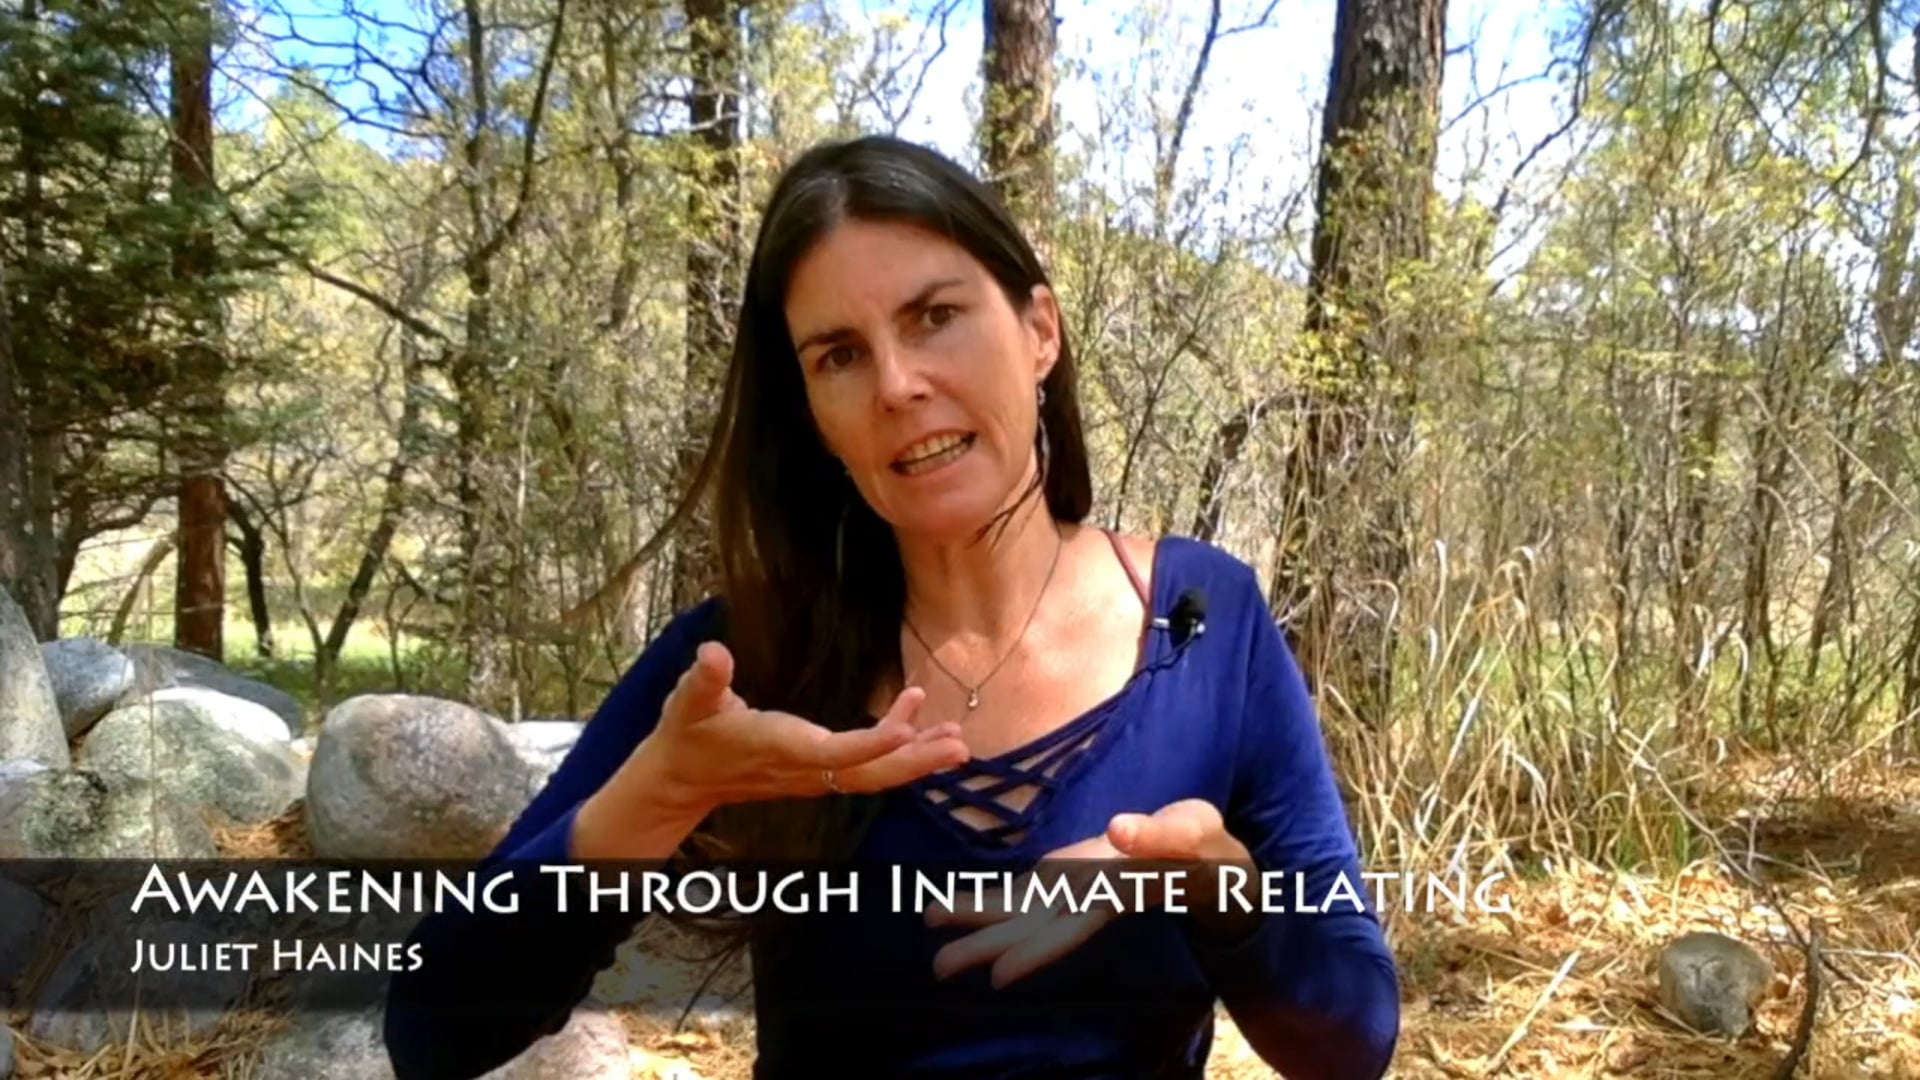 Awakening Through Intimate Relating - Juliet Haines